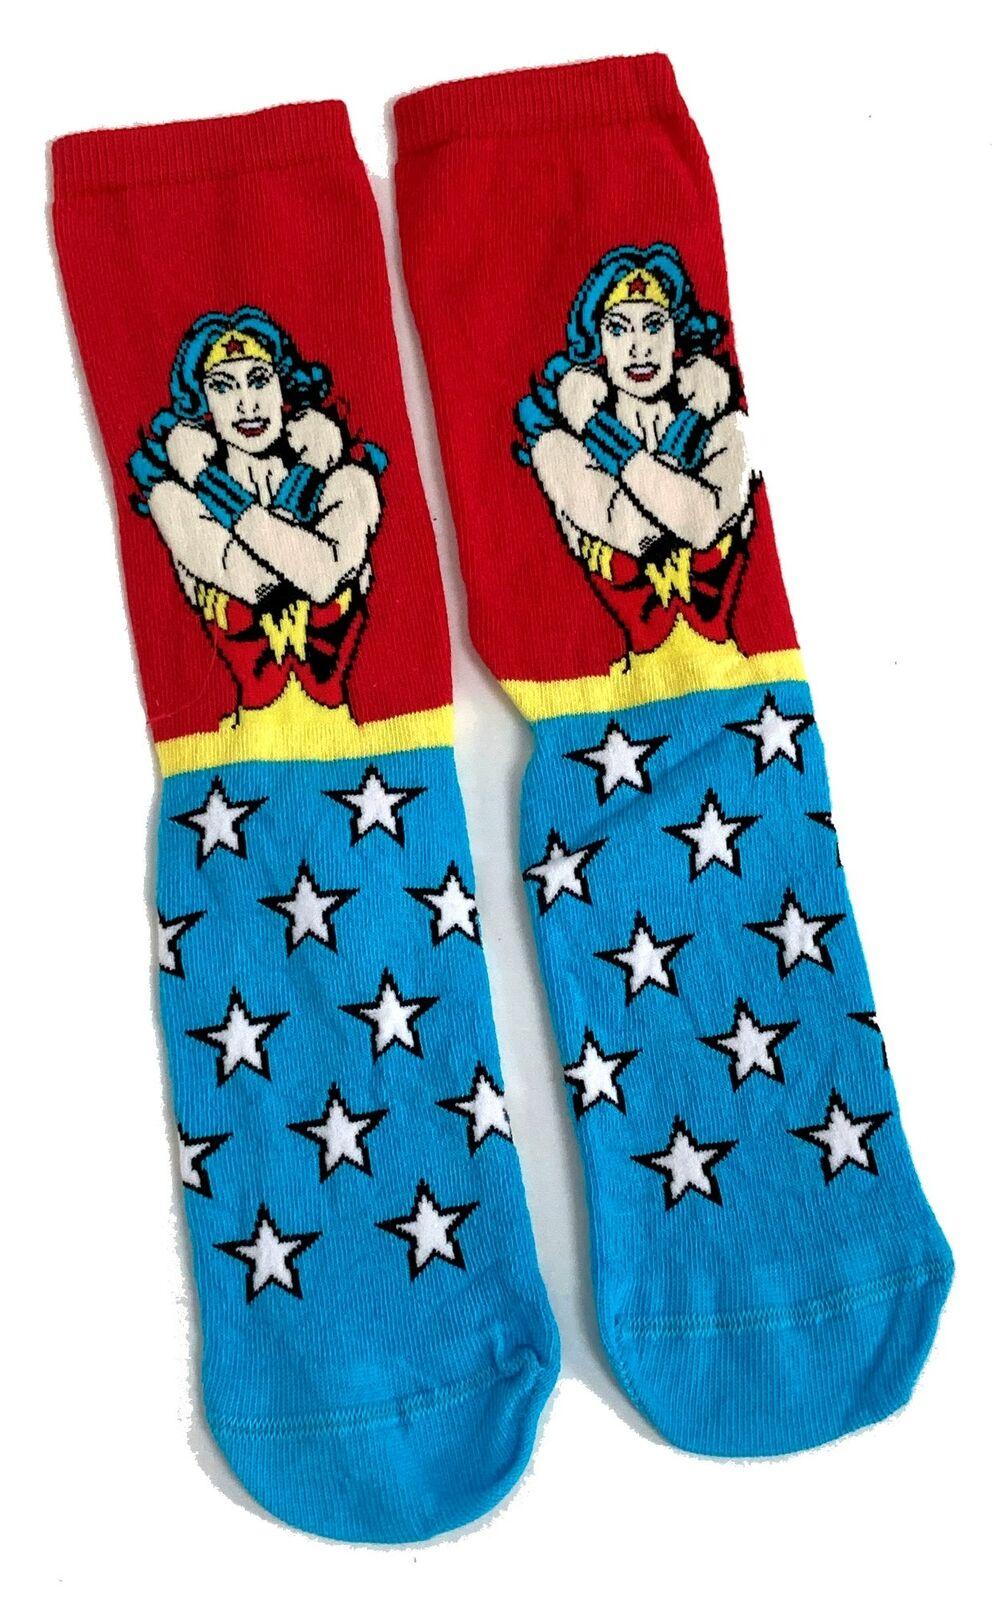 Mens Wonder Woman Posing Arm Bracelets Socks 6-11 UK / 39-45 Eur / 7-12 US